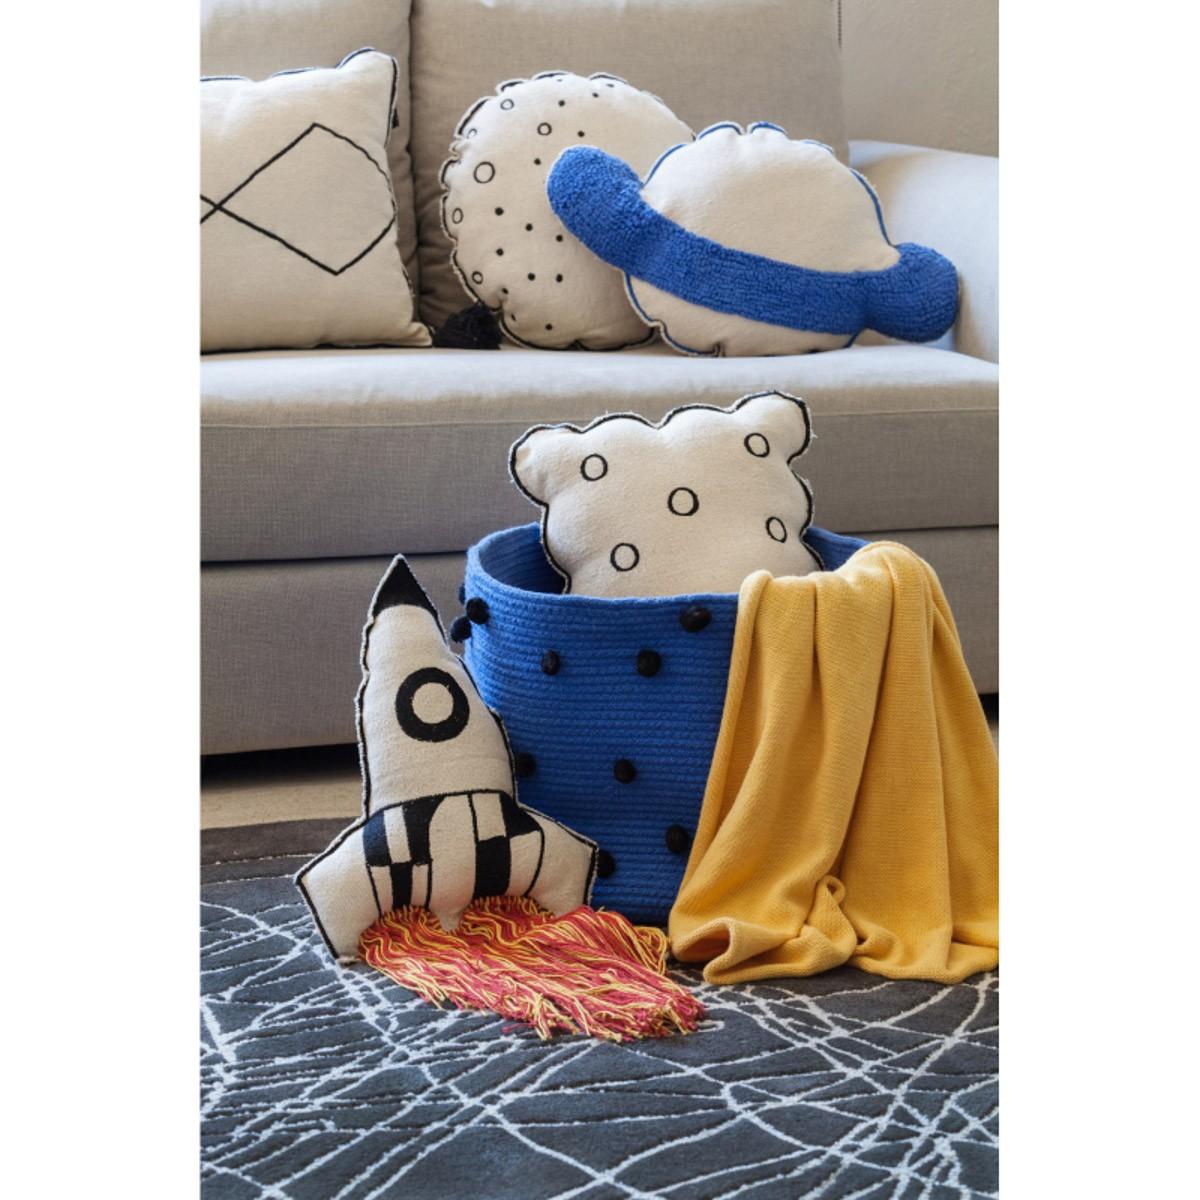 Almofada Lorena Canals Foguete 65 x 30 cm